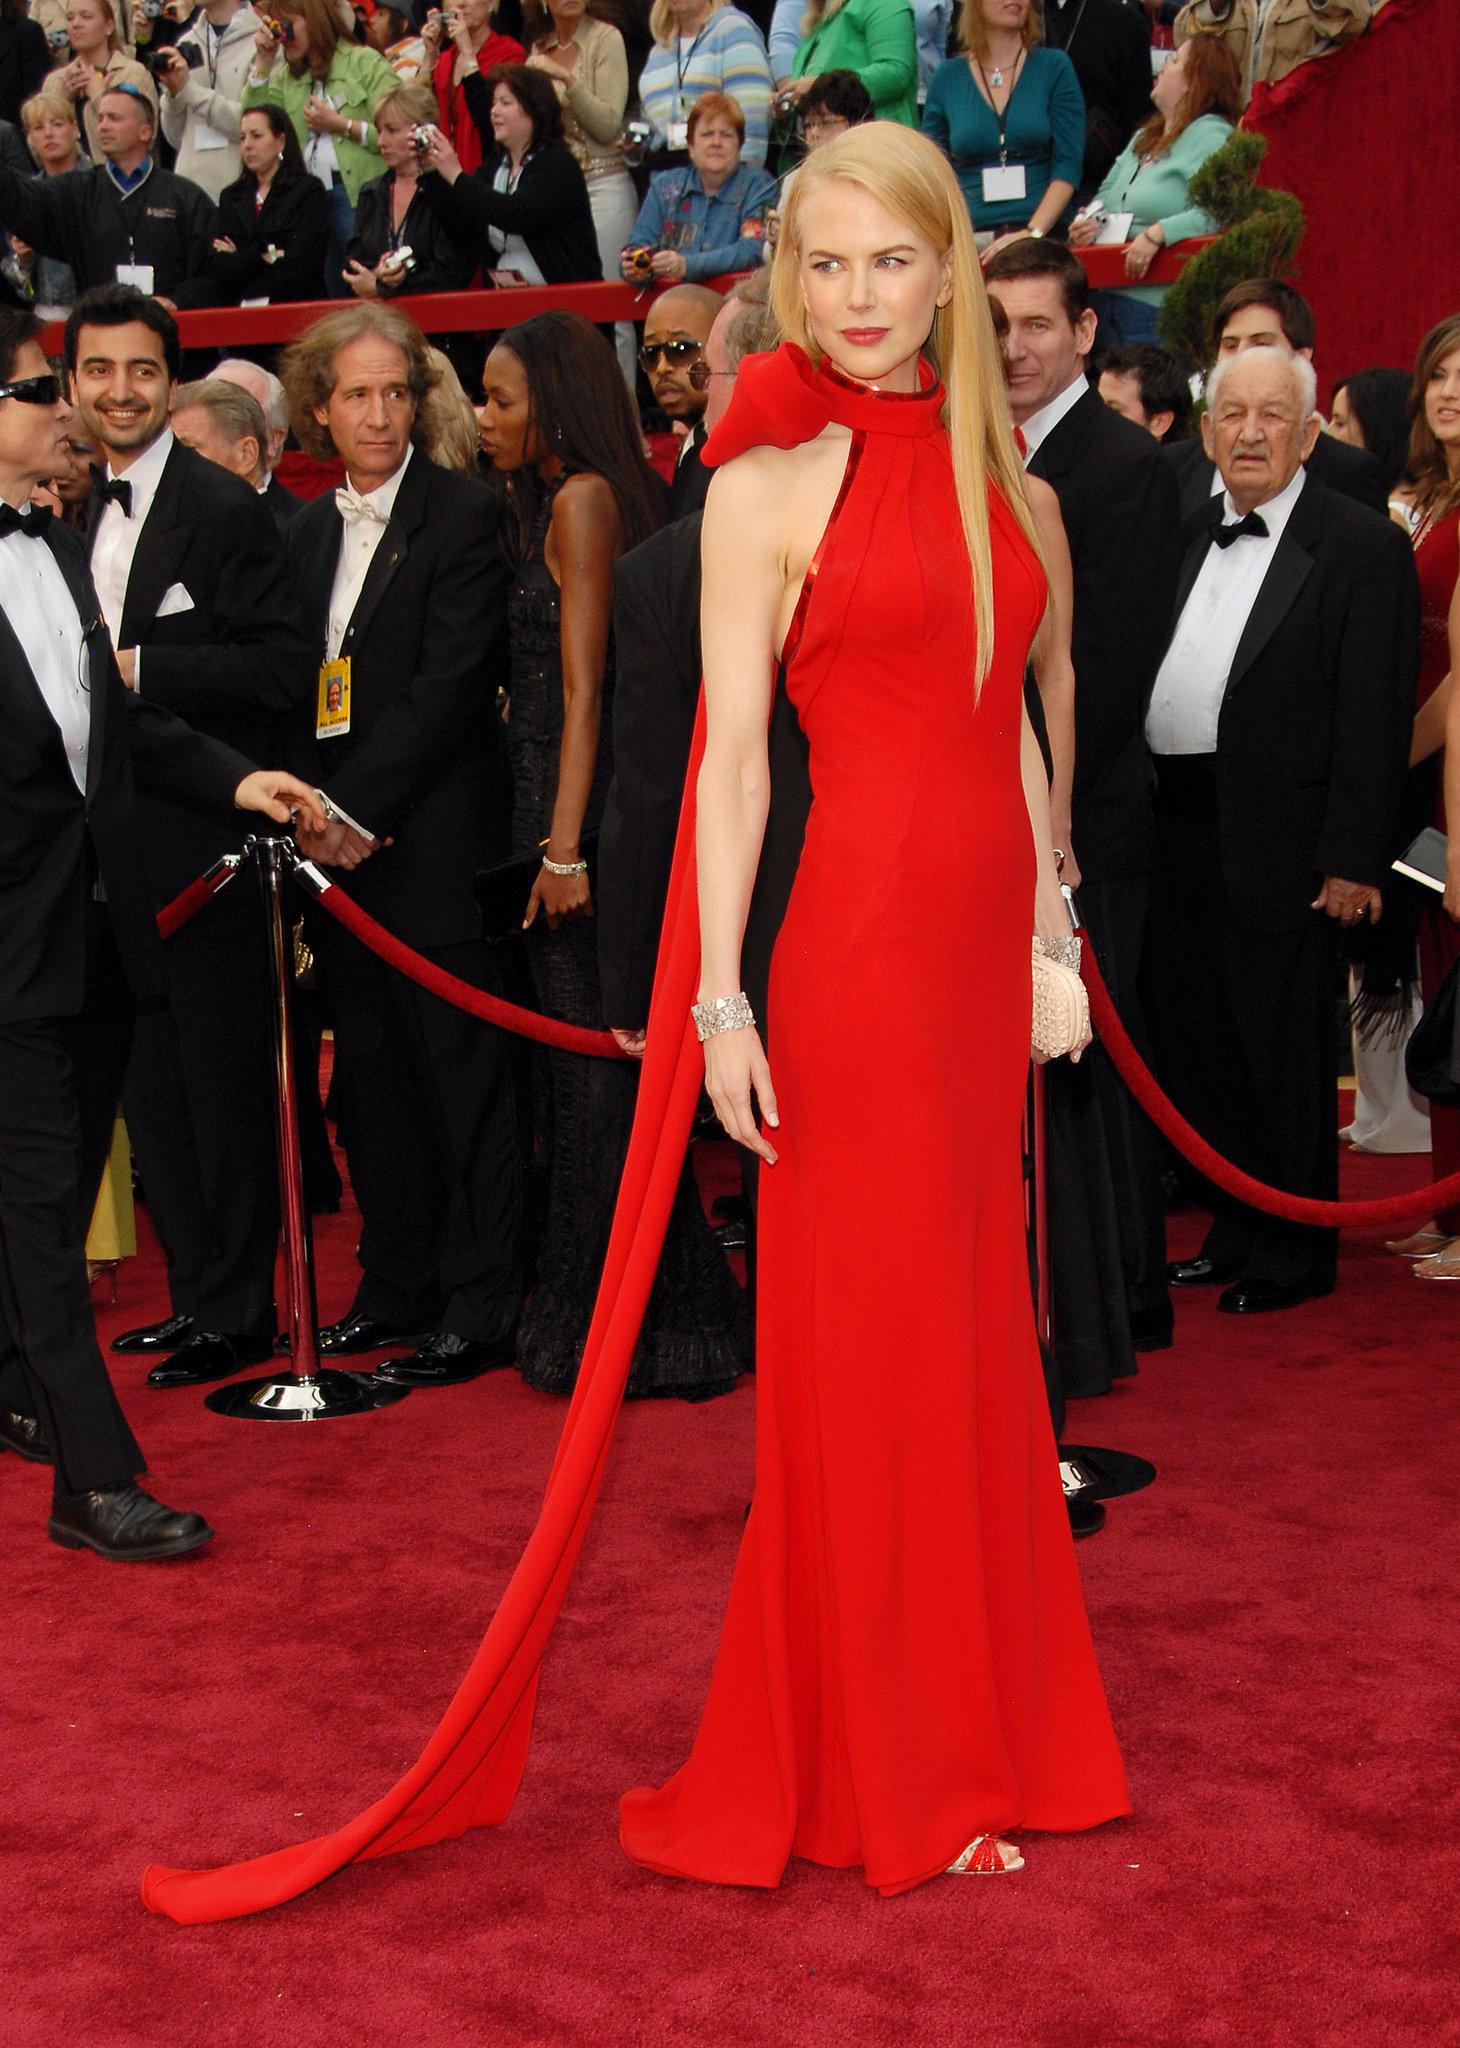 Nicole Kidman at the 2007 Academy Awards